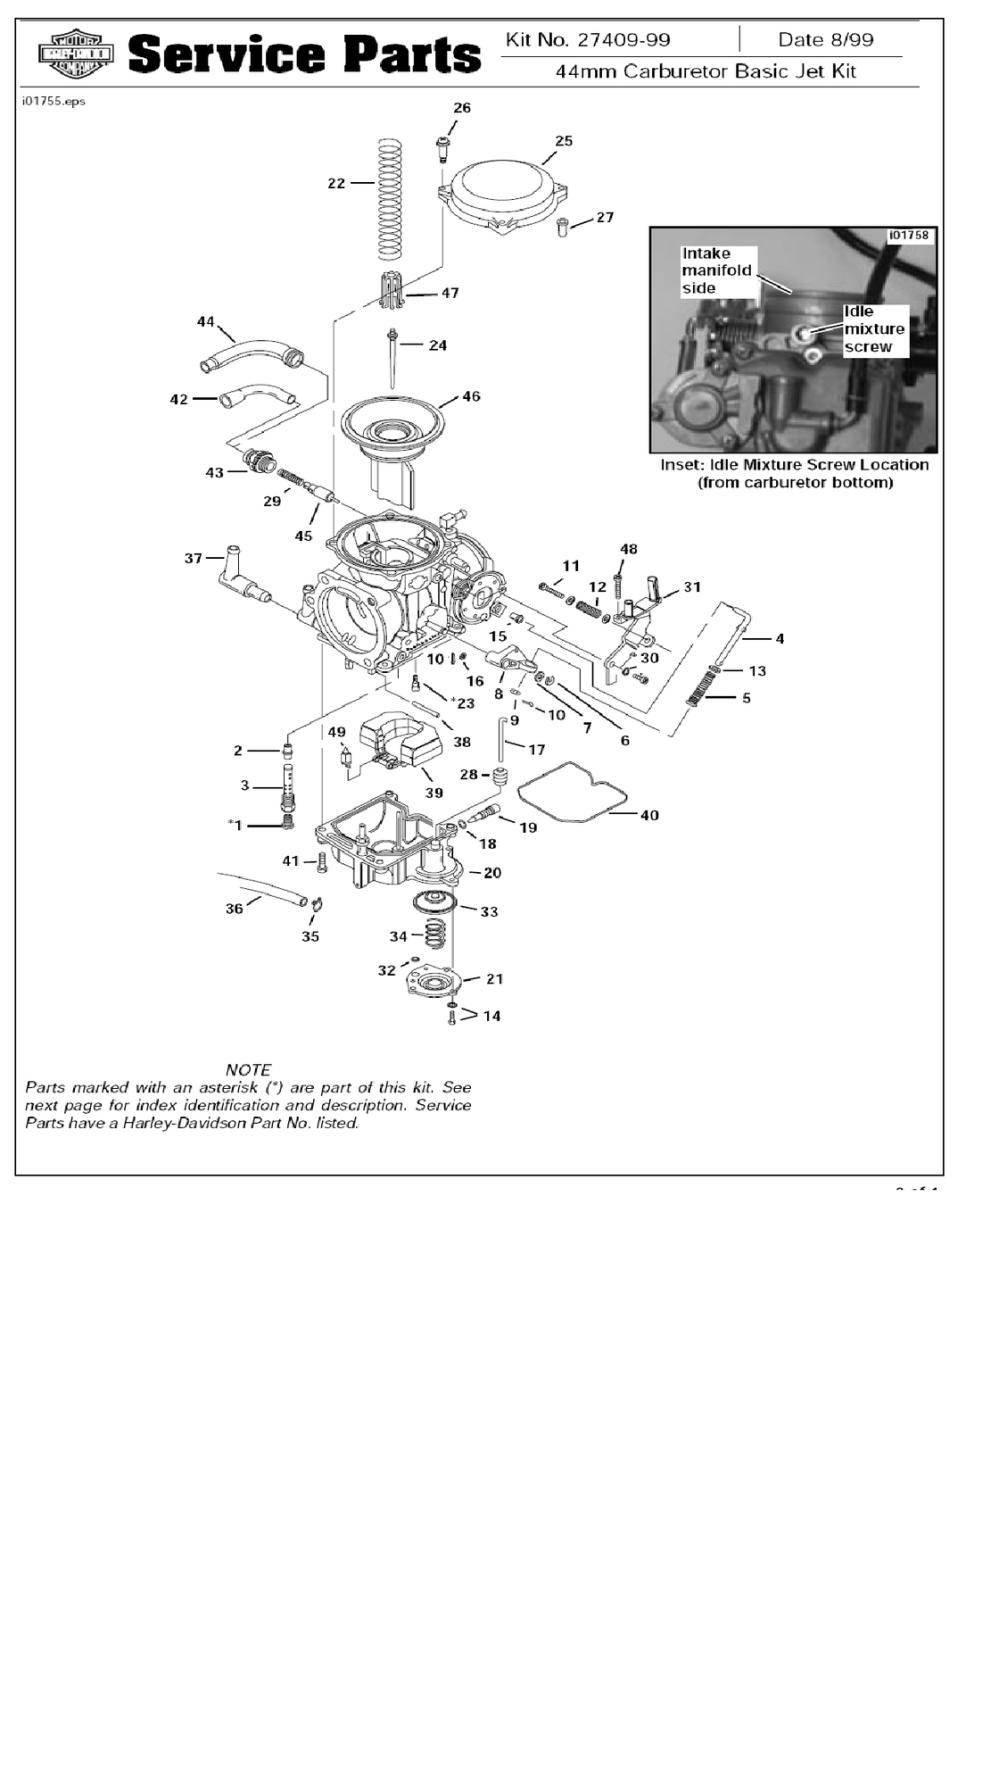 medium resolution of harley fatboy carburetor diagrams wiring diagram expert harley bendix carb diagram 1992 fatboy carburator harley davidson